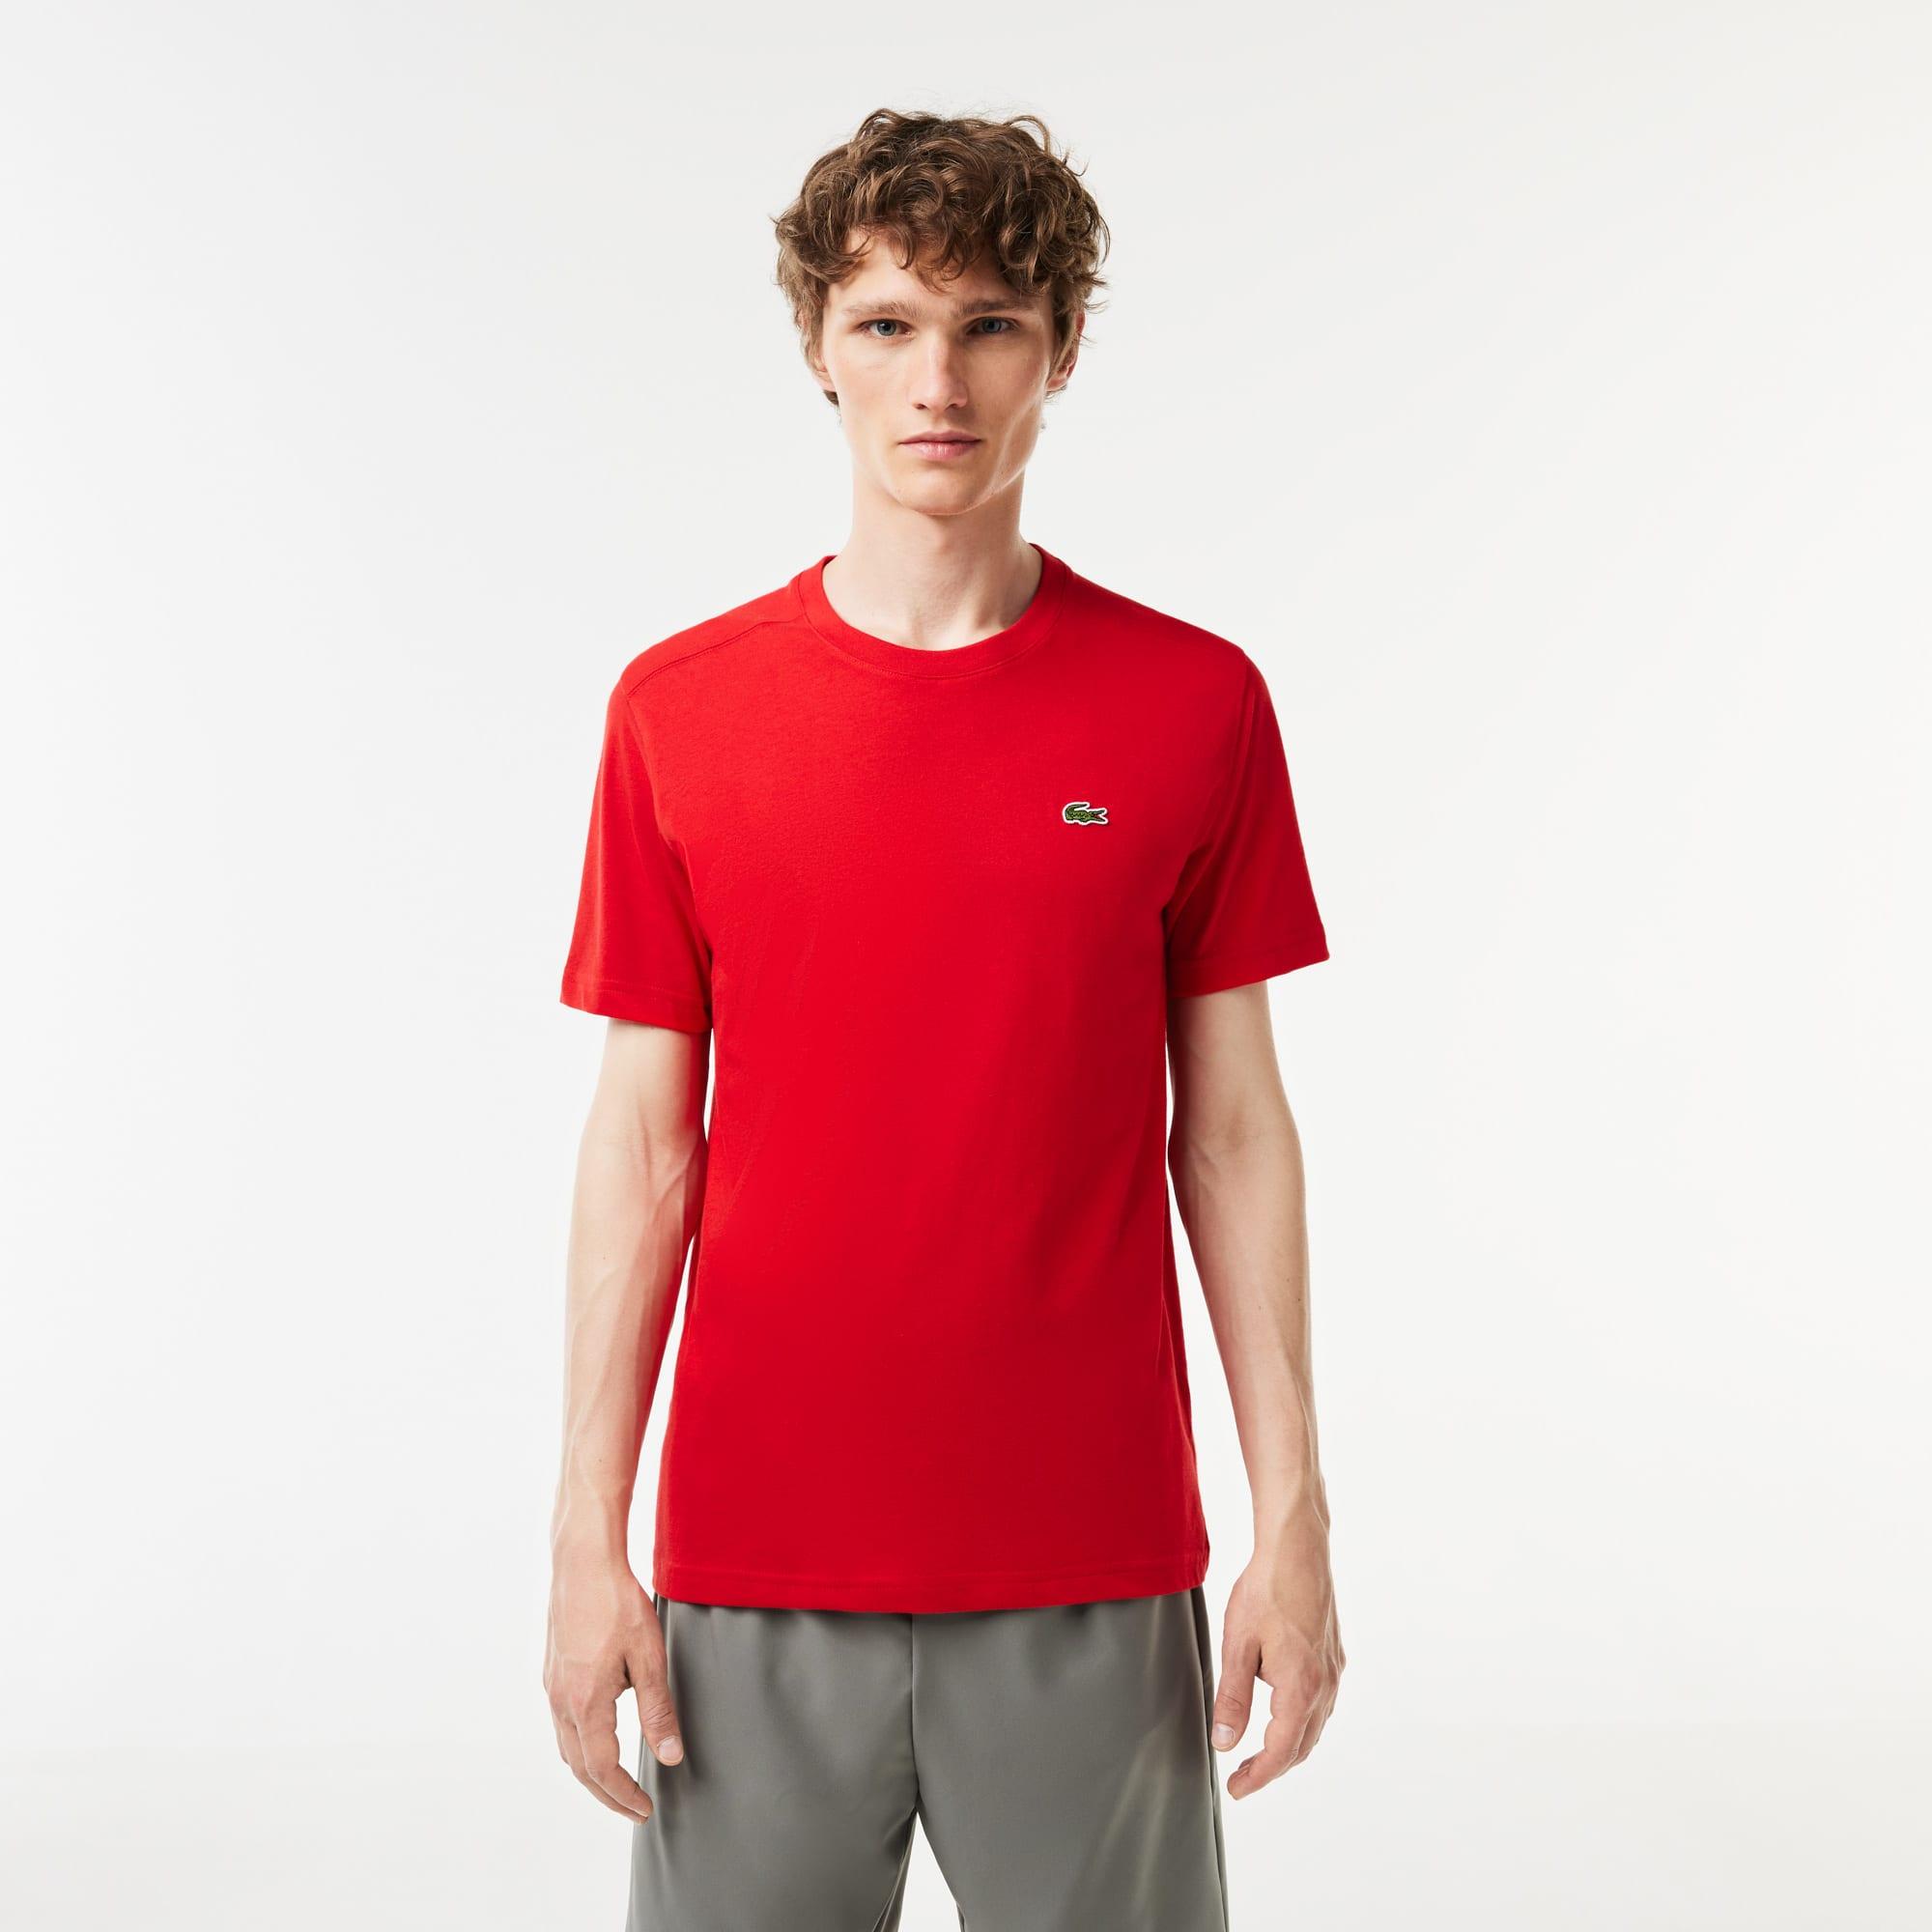 75b57e9bb + 4 colors + 7 colors. Men's SPORT Crew Neck Tennis T-Shirt. $50.00. White;  Grey Chine; Yellow